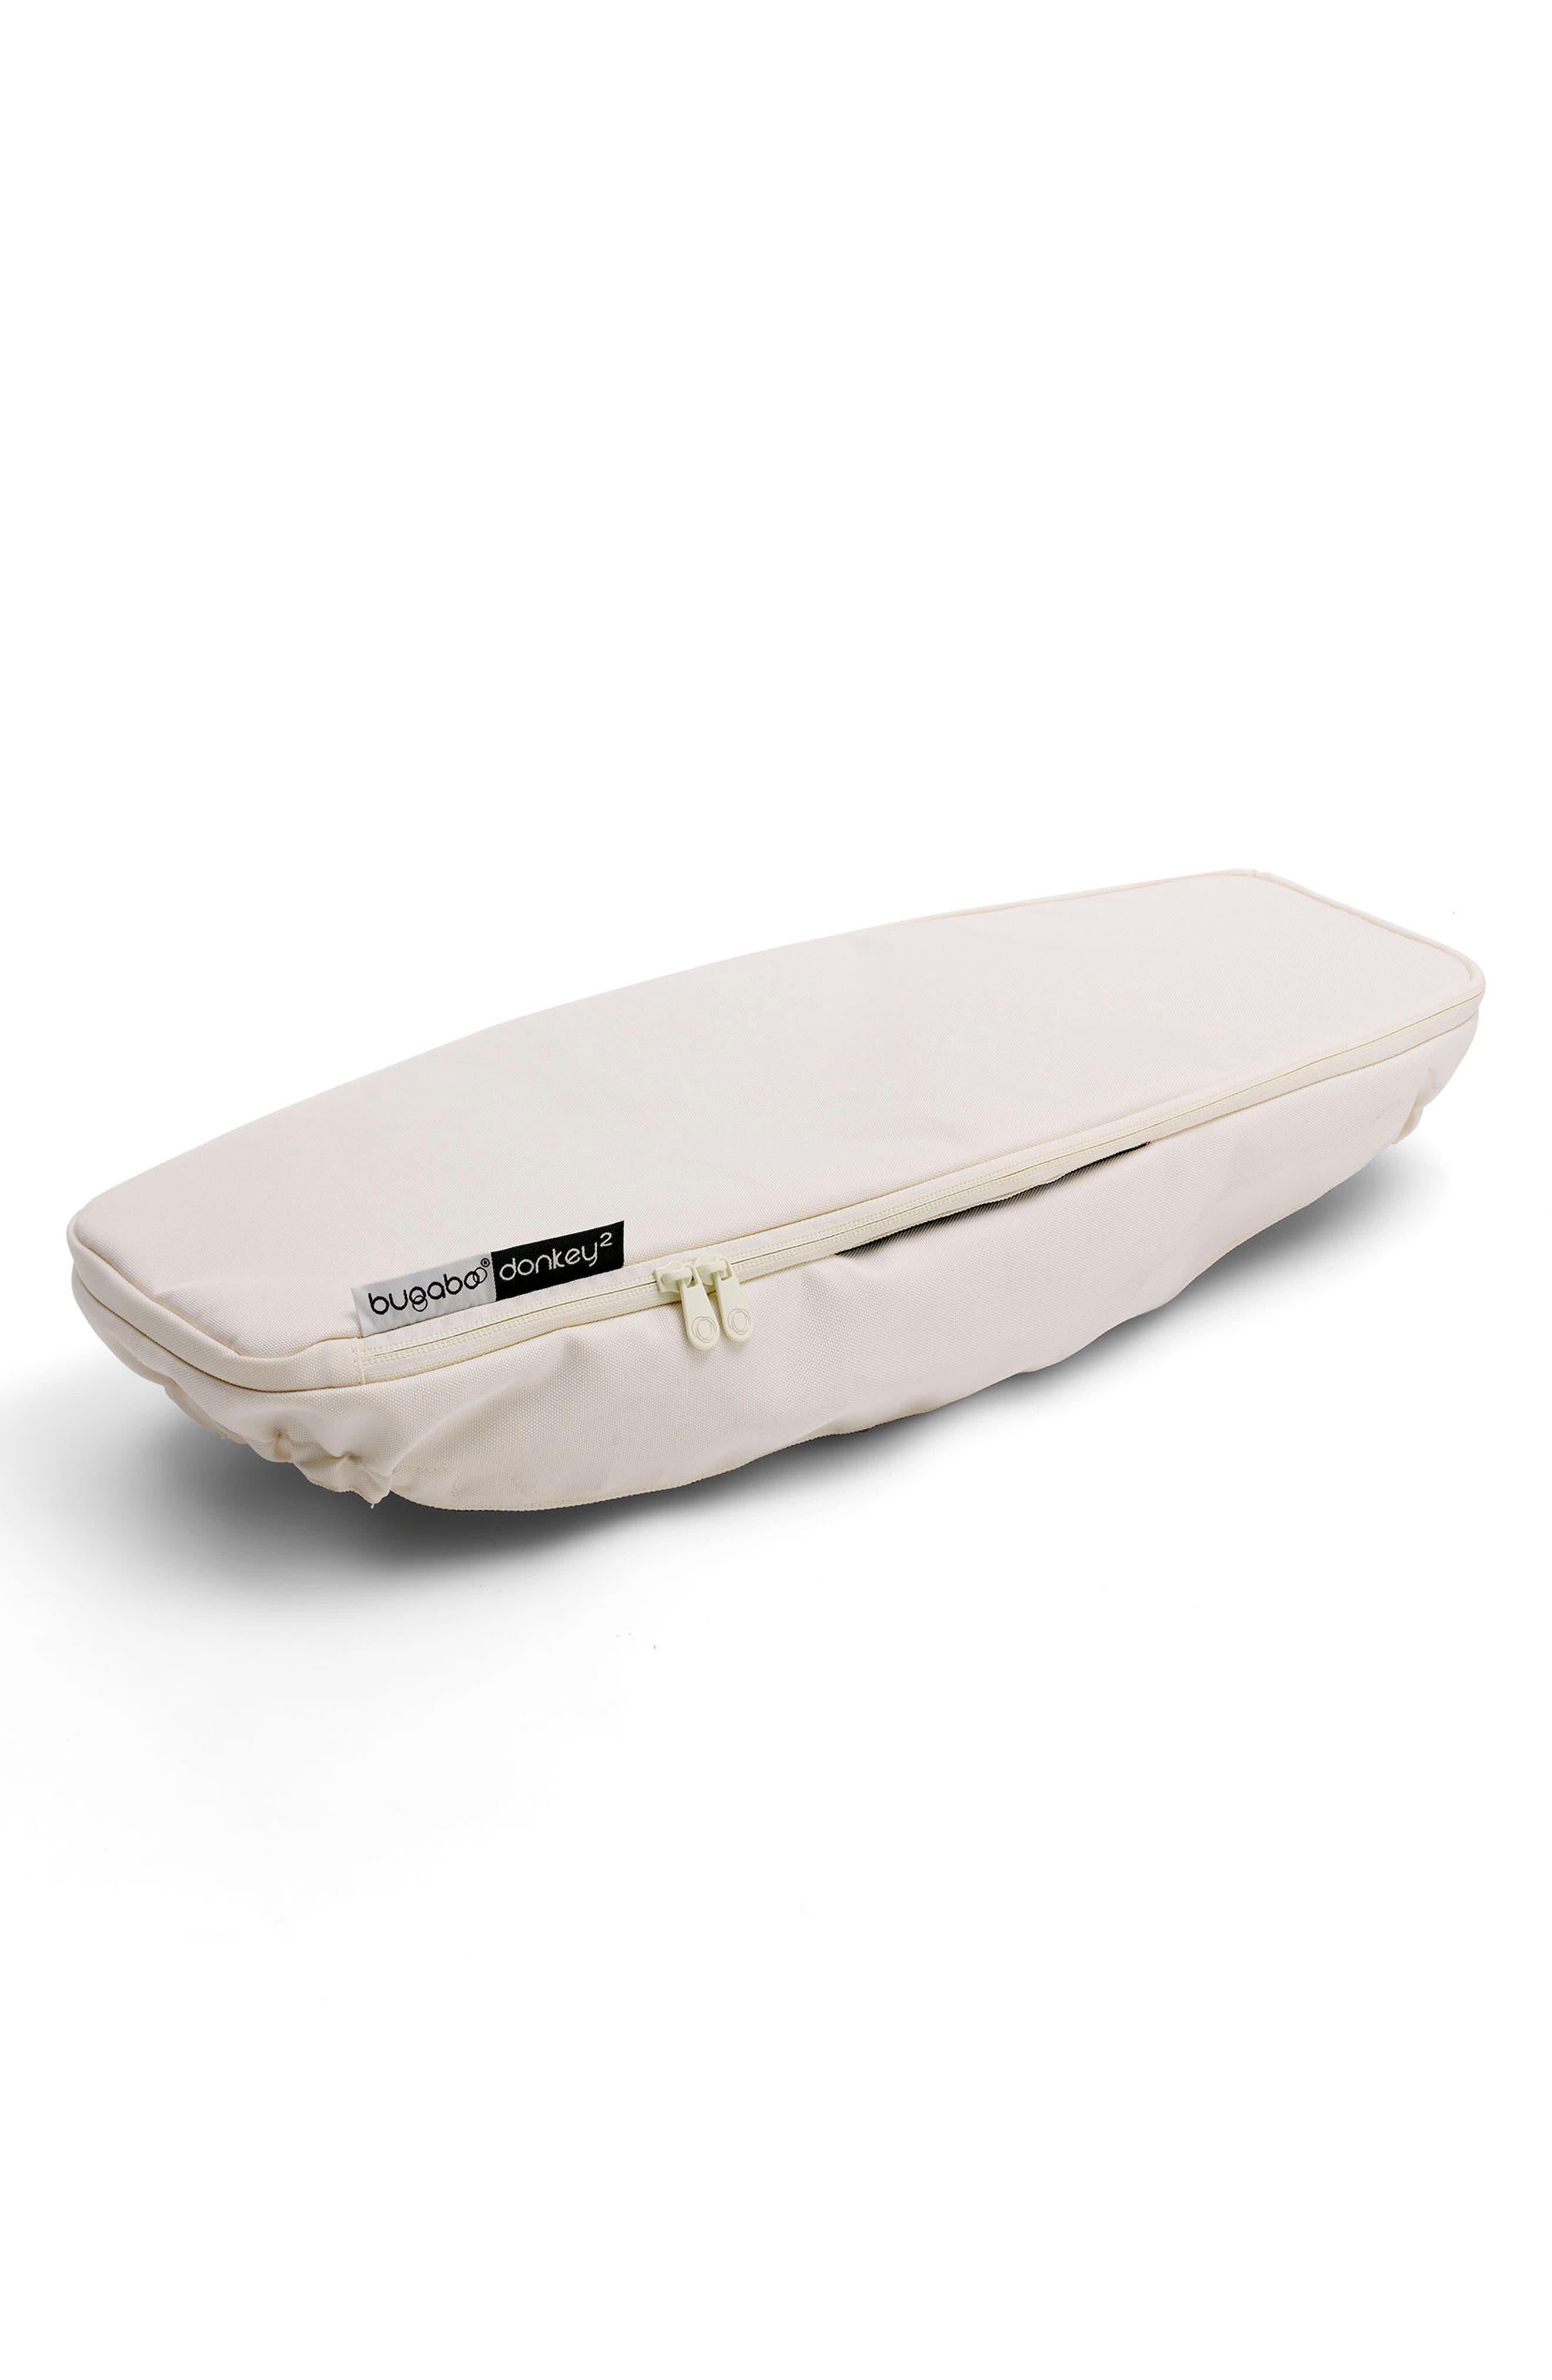 Bugaboo Side Luggage Basket Cover for Donkey2 Stroller